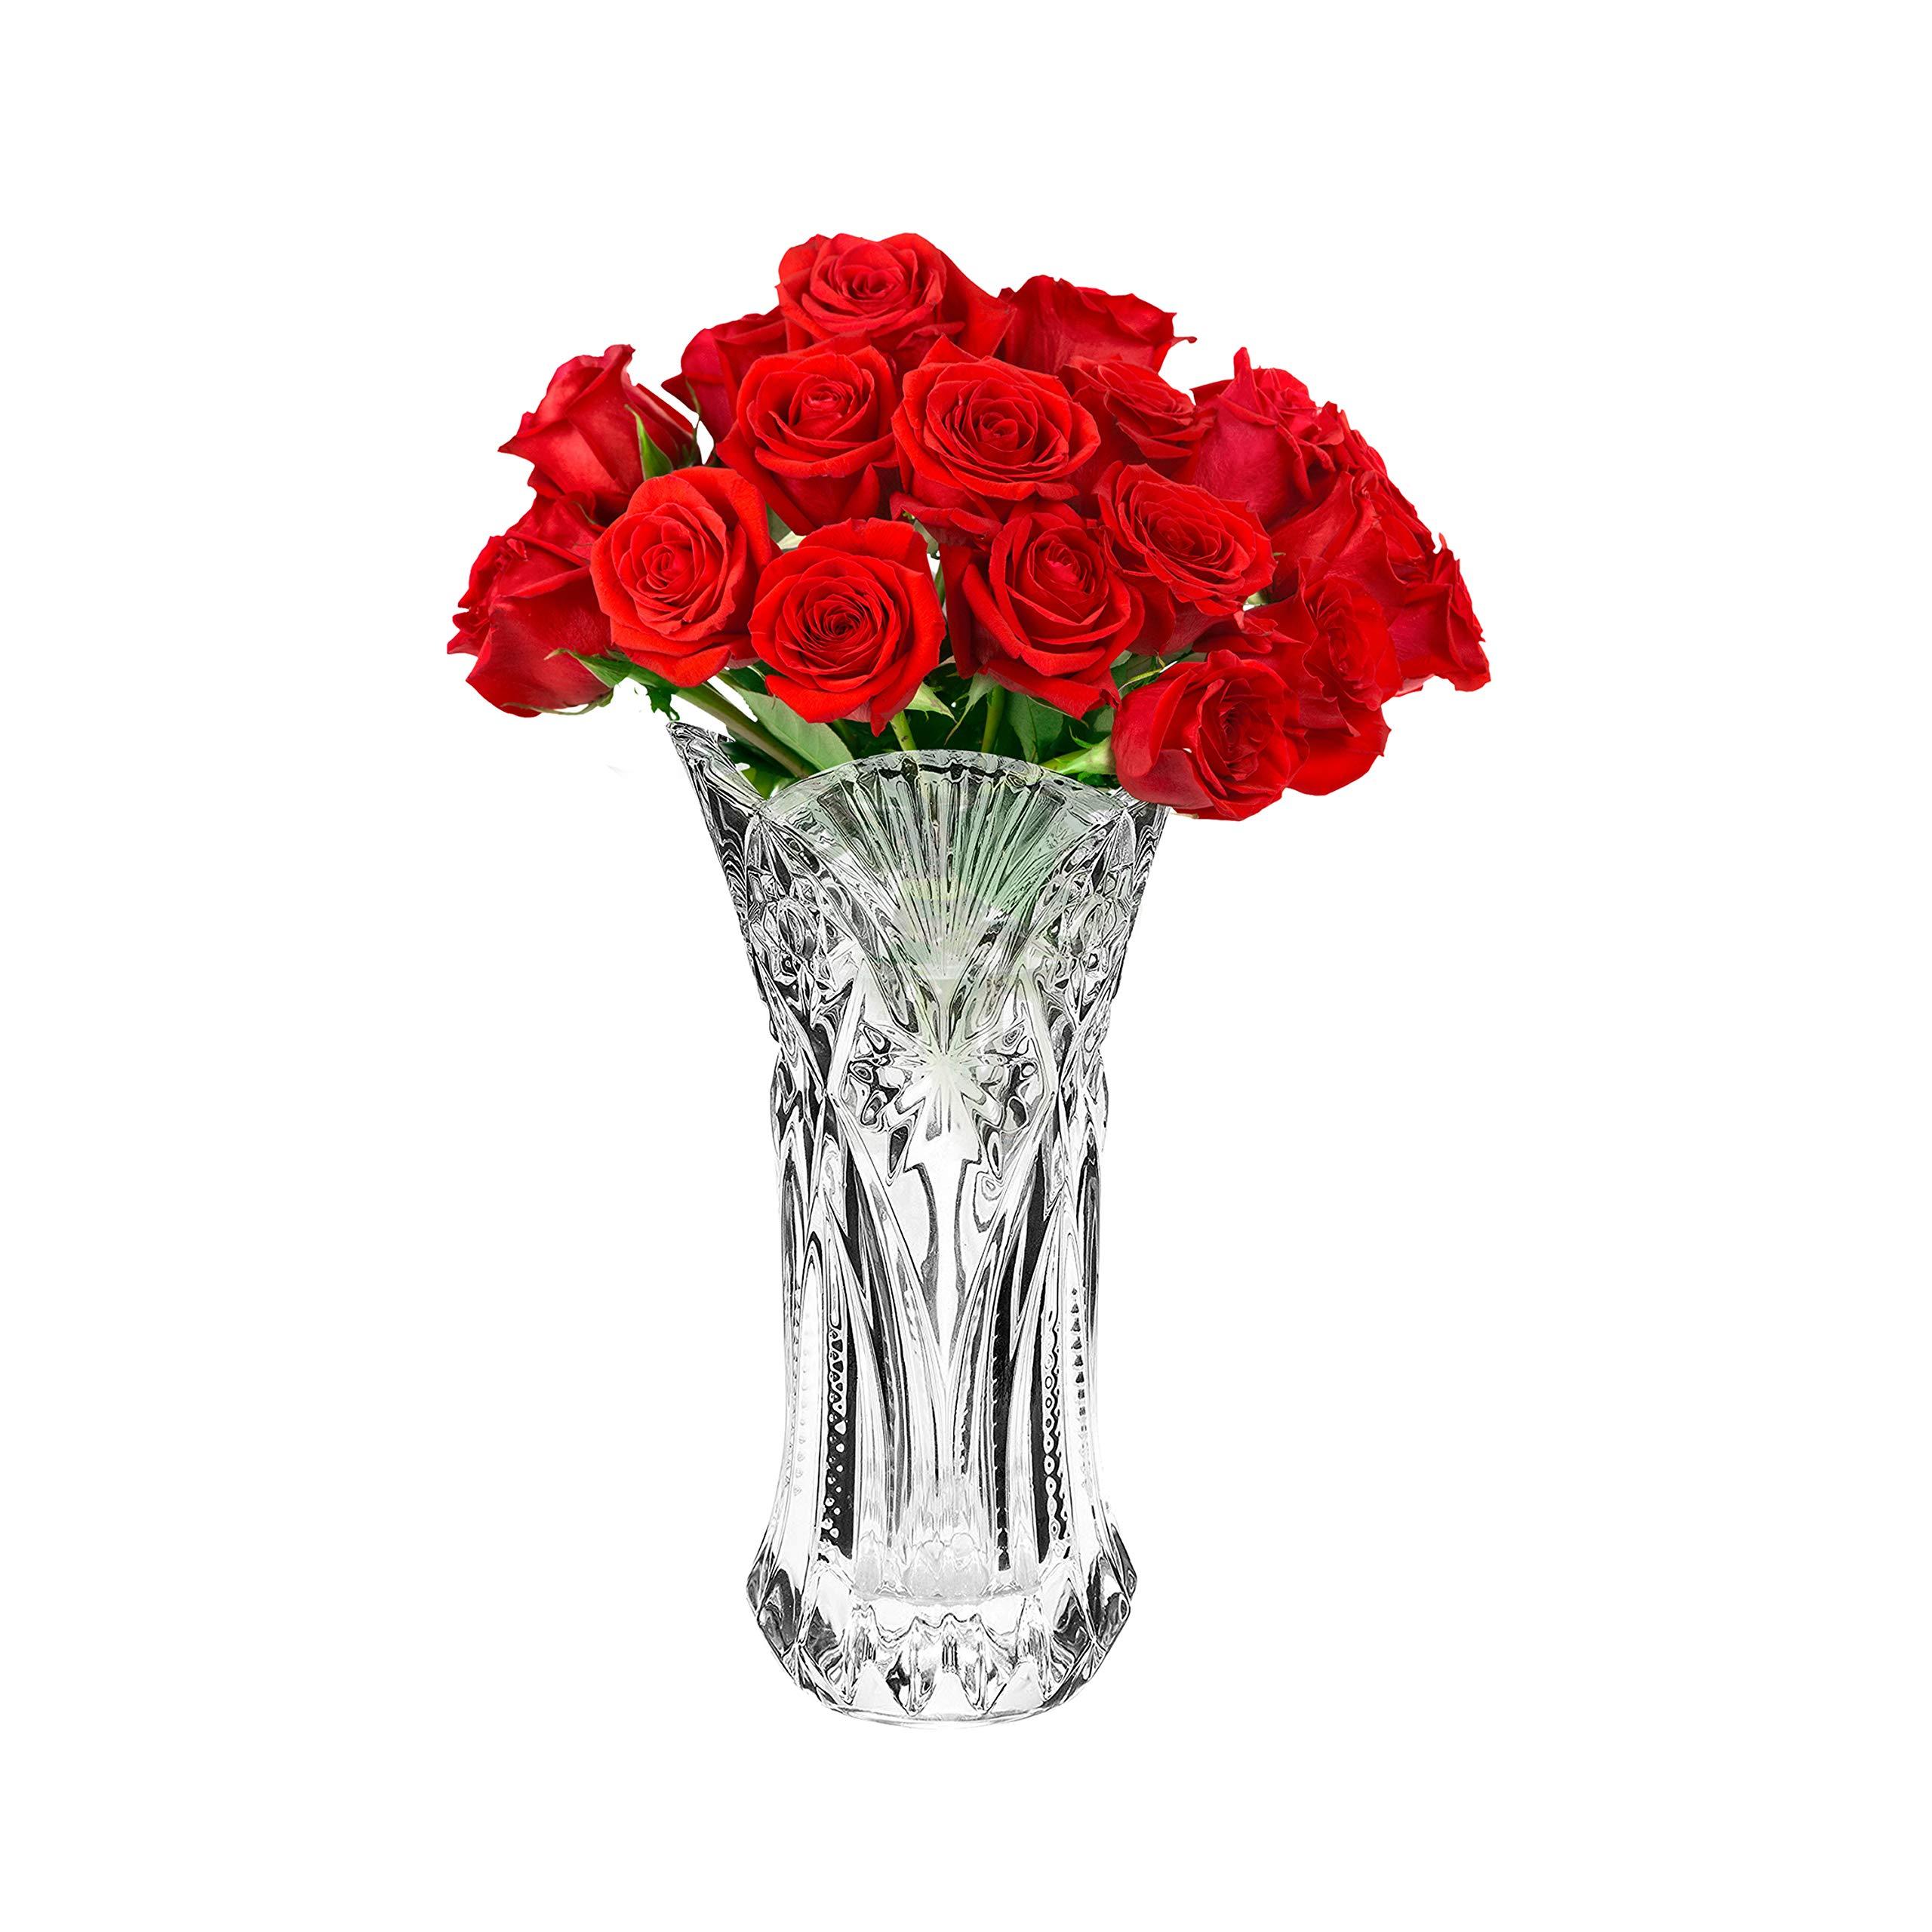 Kurtzy Crystal Flowers Vases 1pcs 29cm Melodia Glass Vases Large Tabletop Vases For Home Graden Church Shop Decorations Luminous Effect Flower Vase Centrepiece For Party Event Decoratives Buy Online In Bosnia